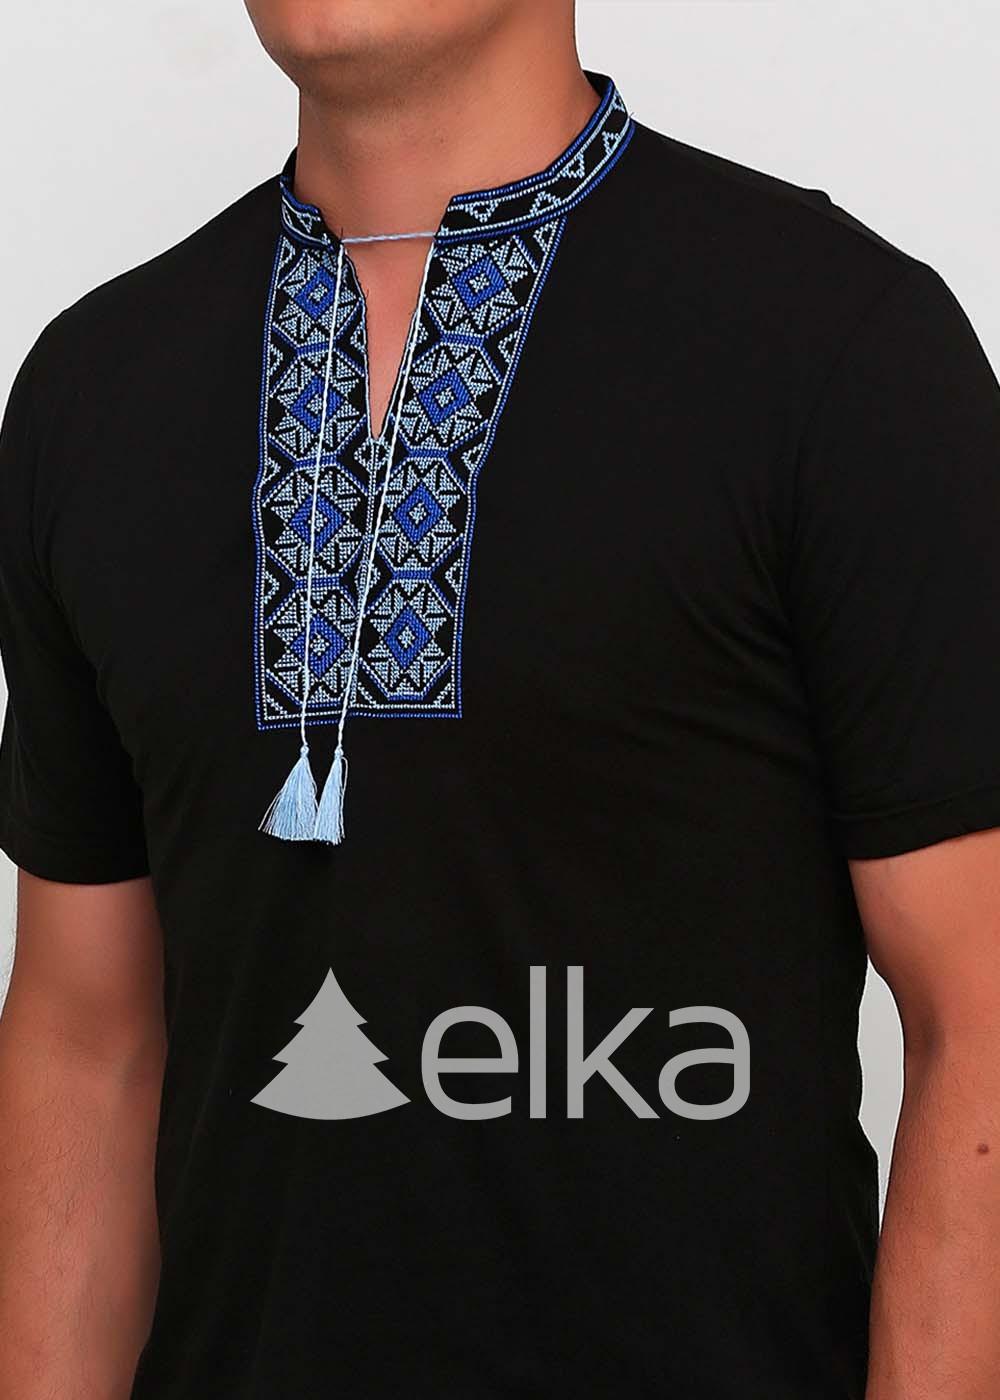 Мужская вышитая футболка черная Ромбы